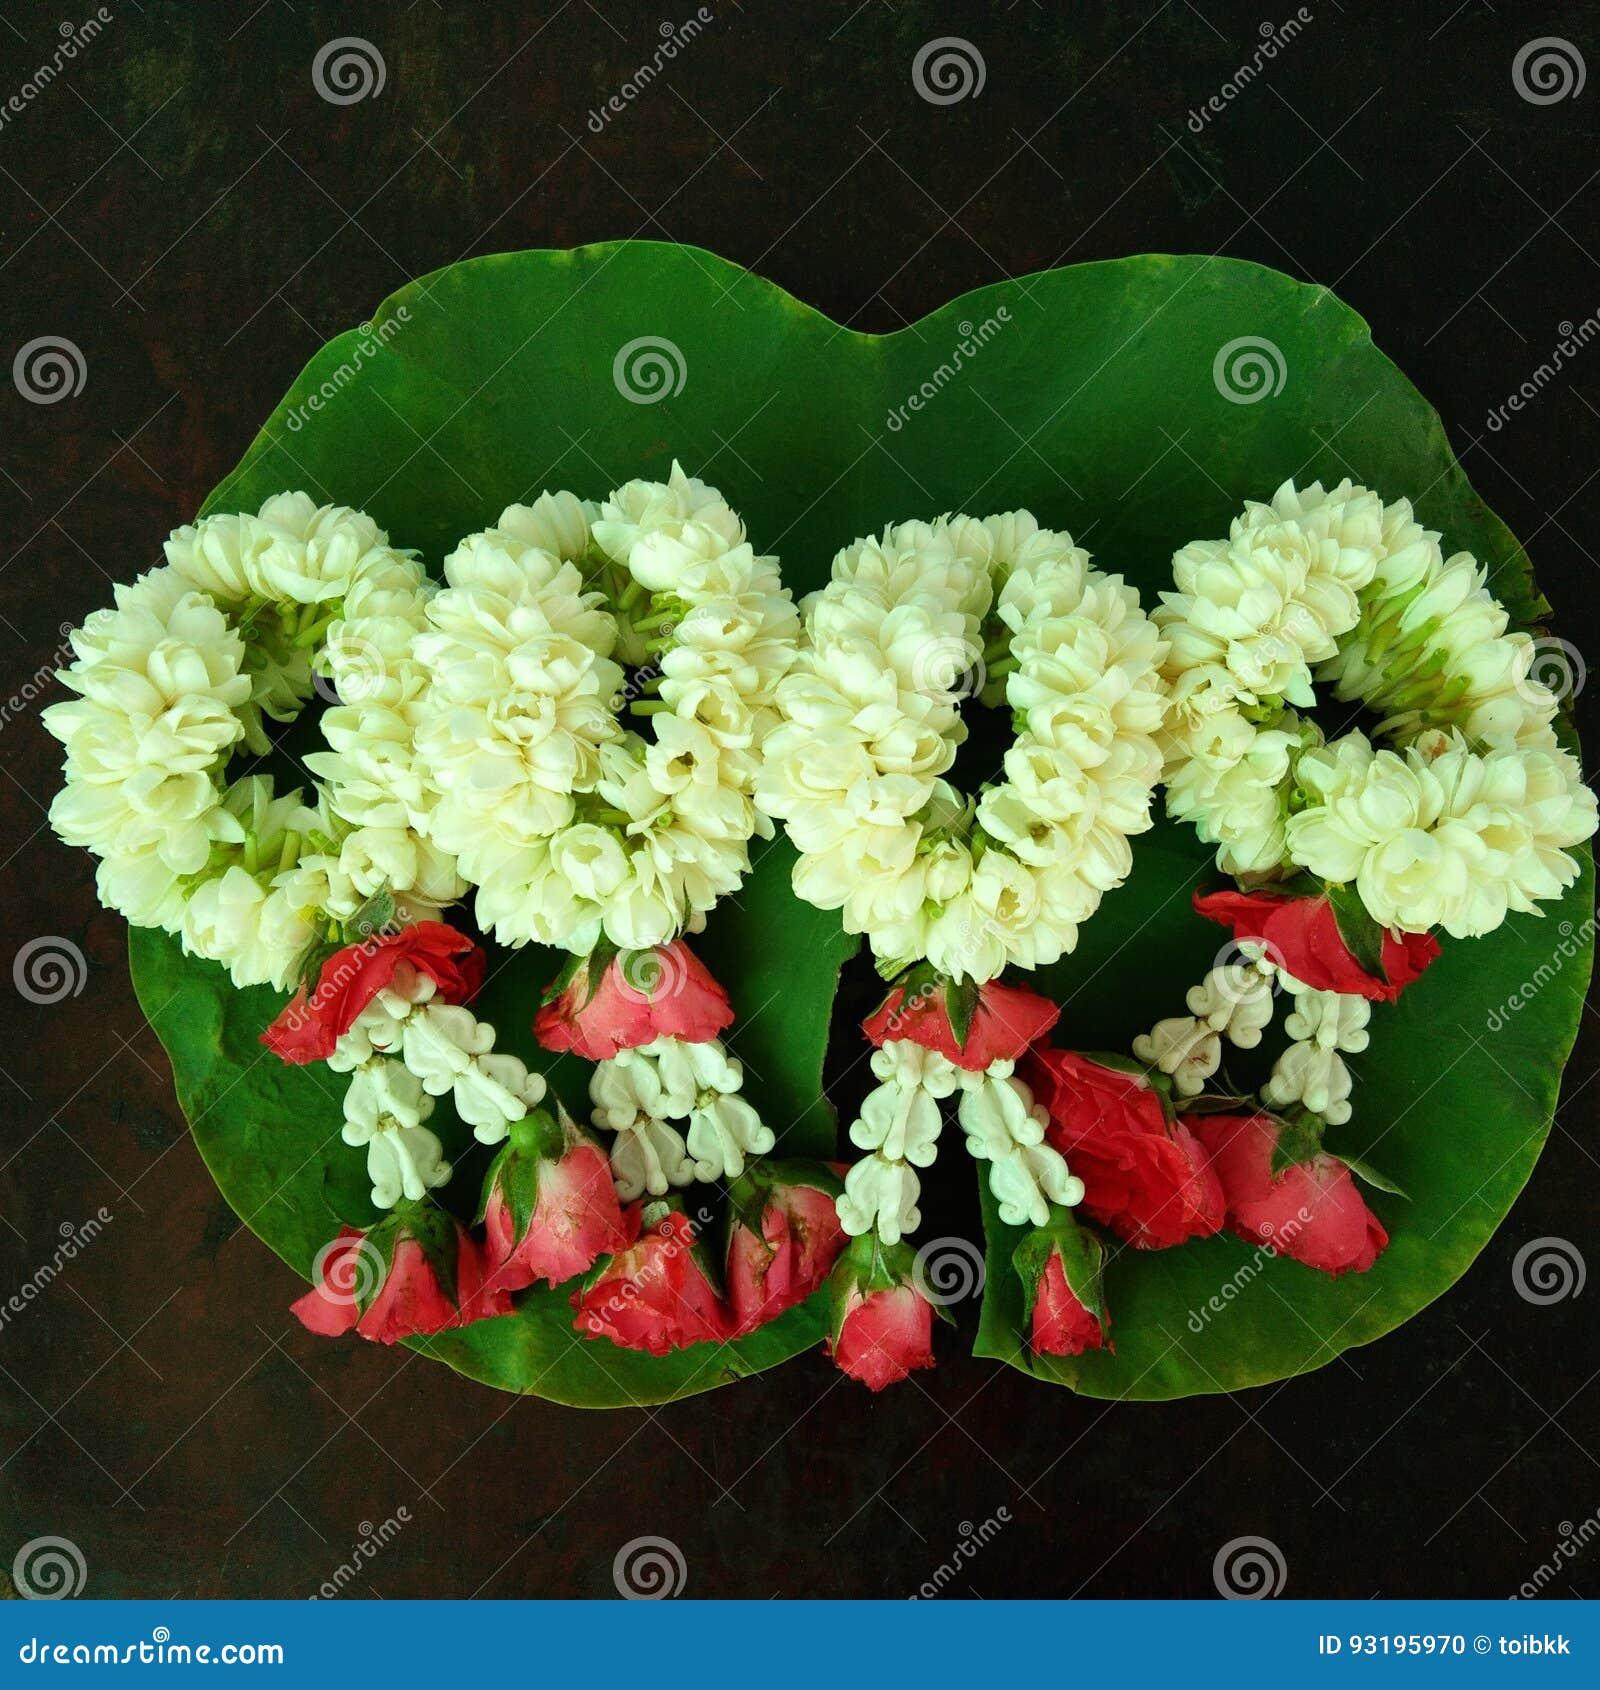 Jasmine Flower Garlands Stock Photo Image Of Pattern 93195970